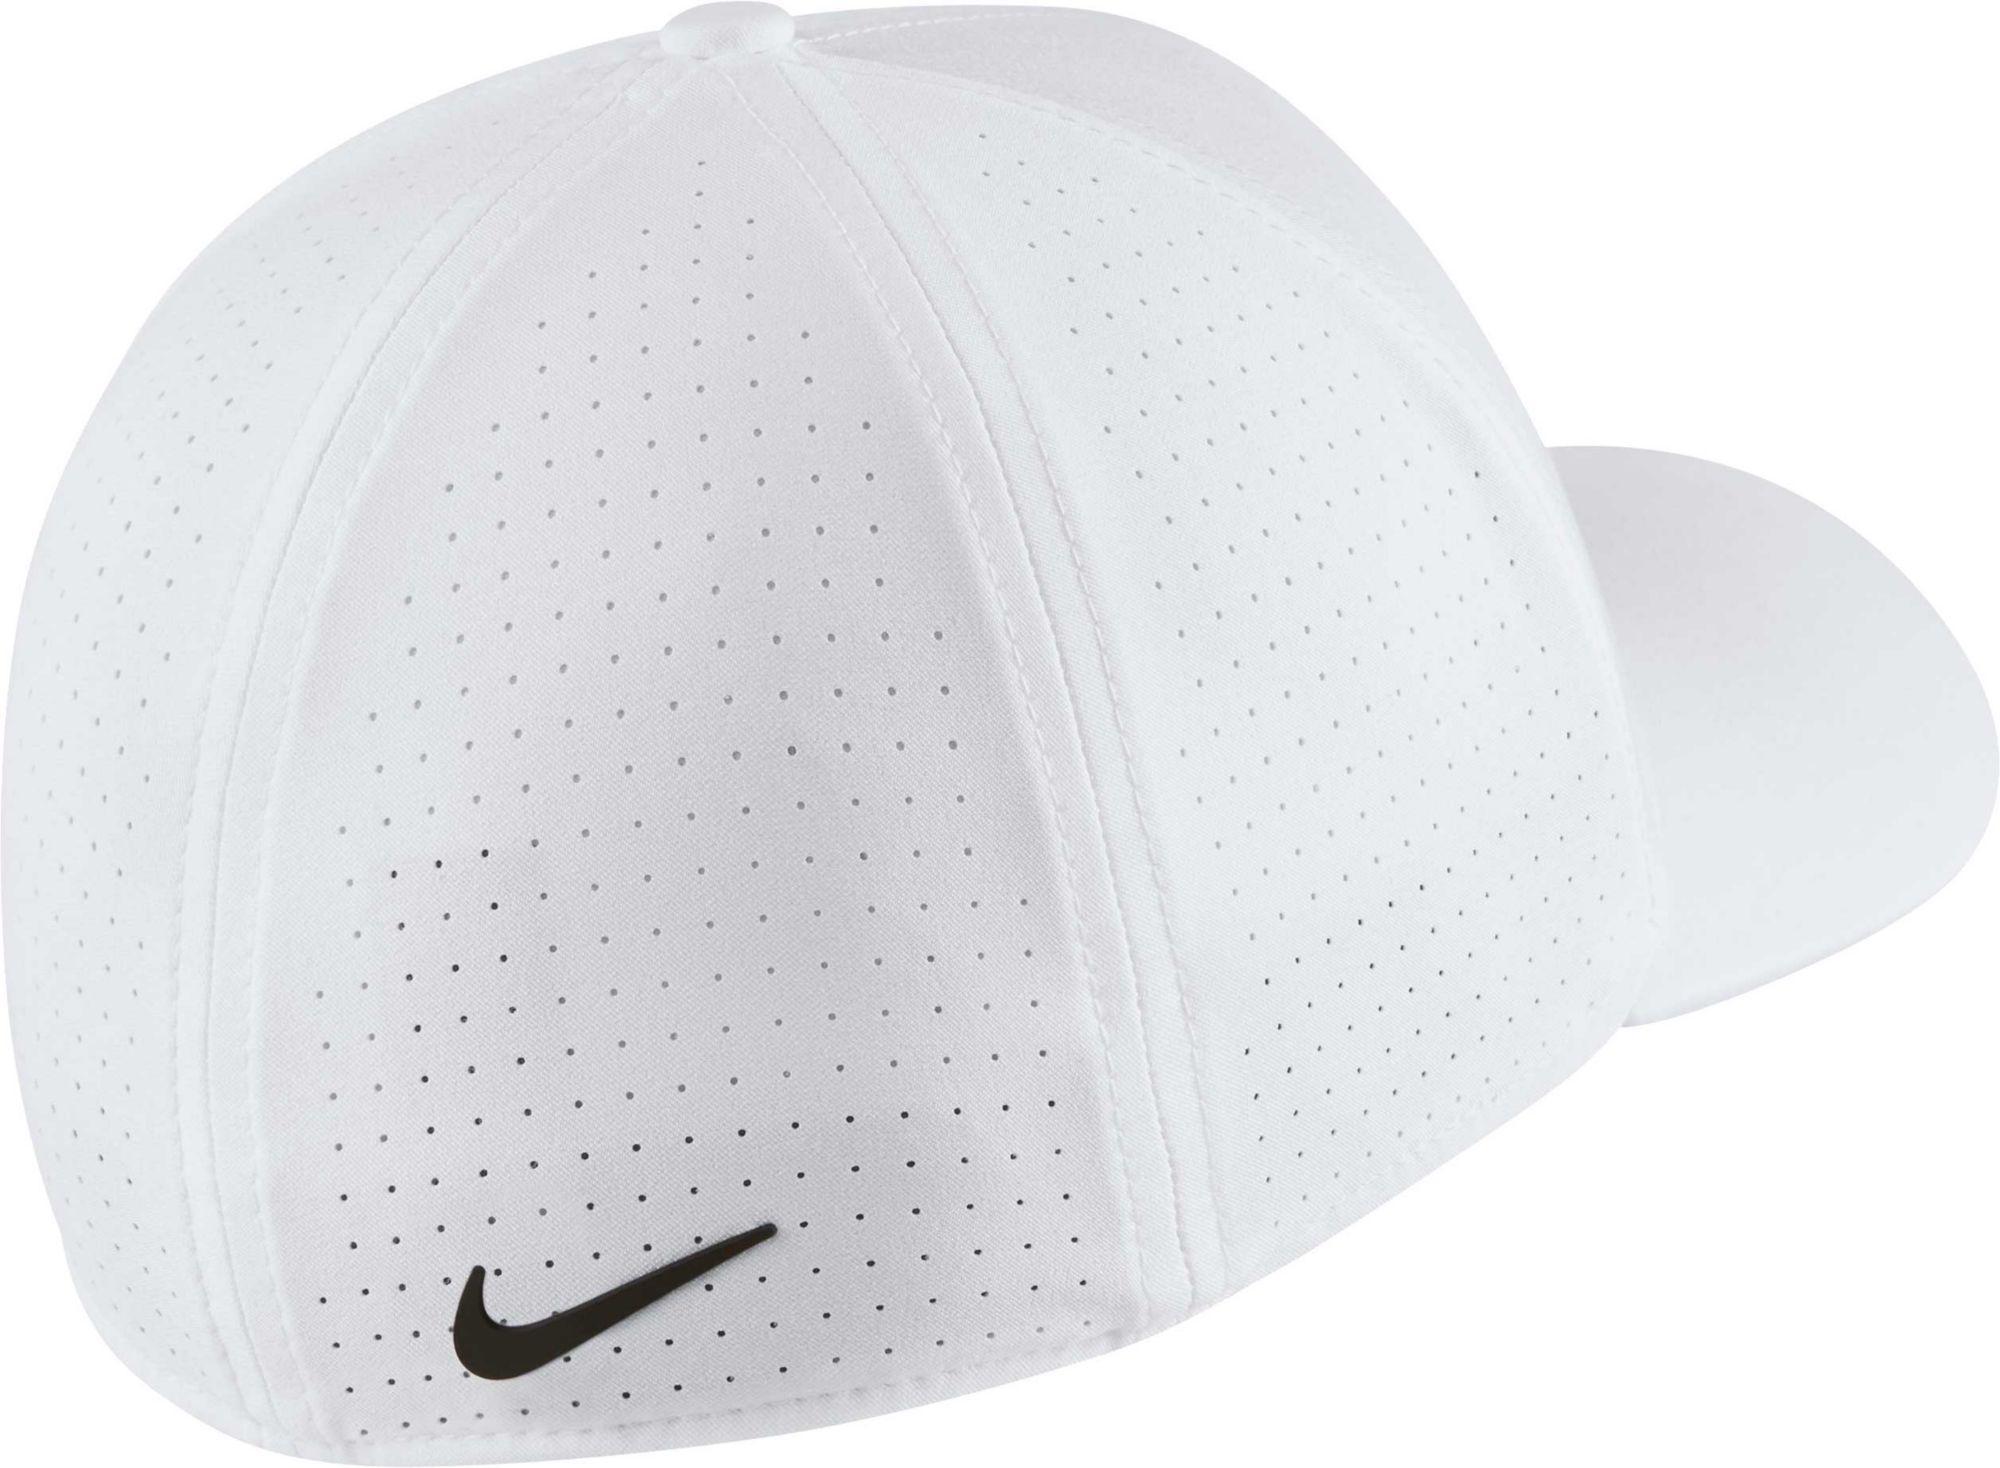 Nike - White Aerobill Tw Classic99 Golf Hat for Men - Lyst. View fullscreen 669aae2adaa4